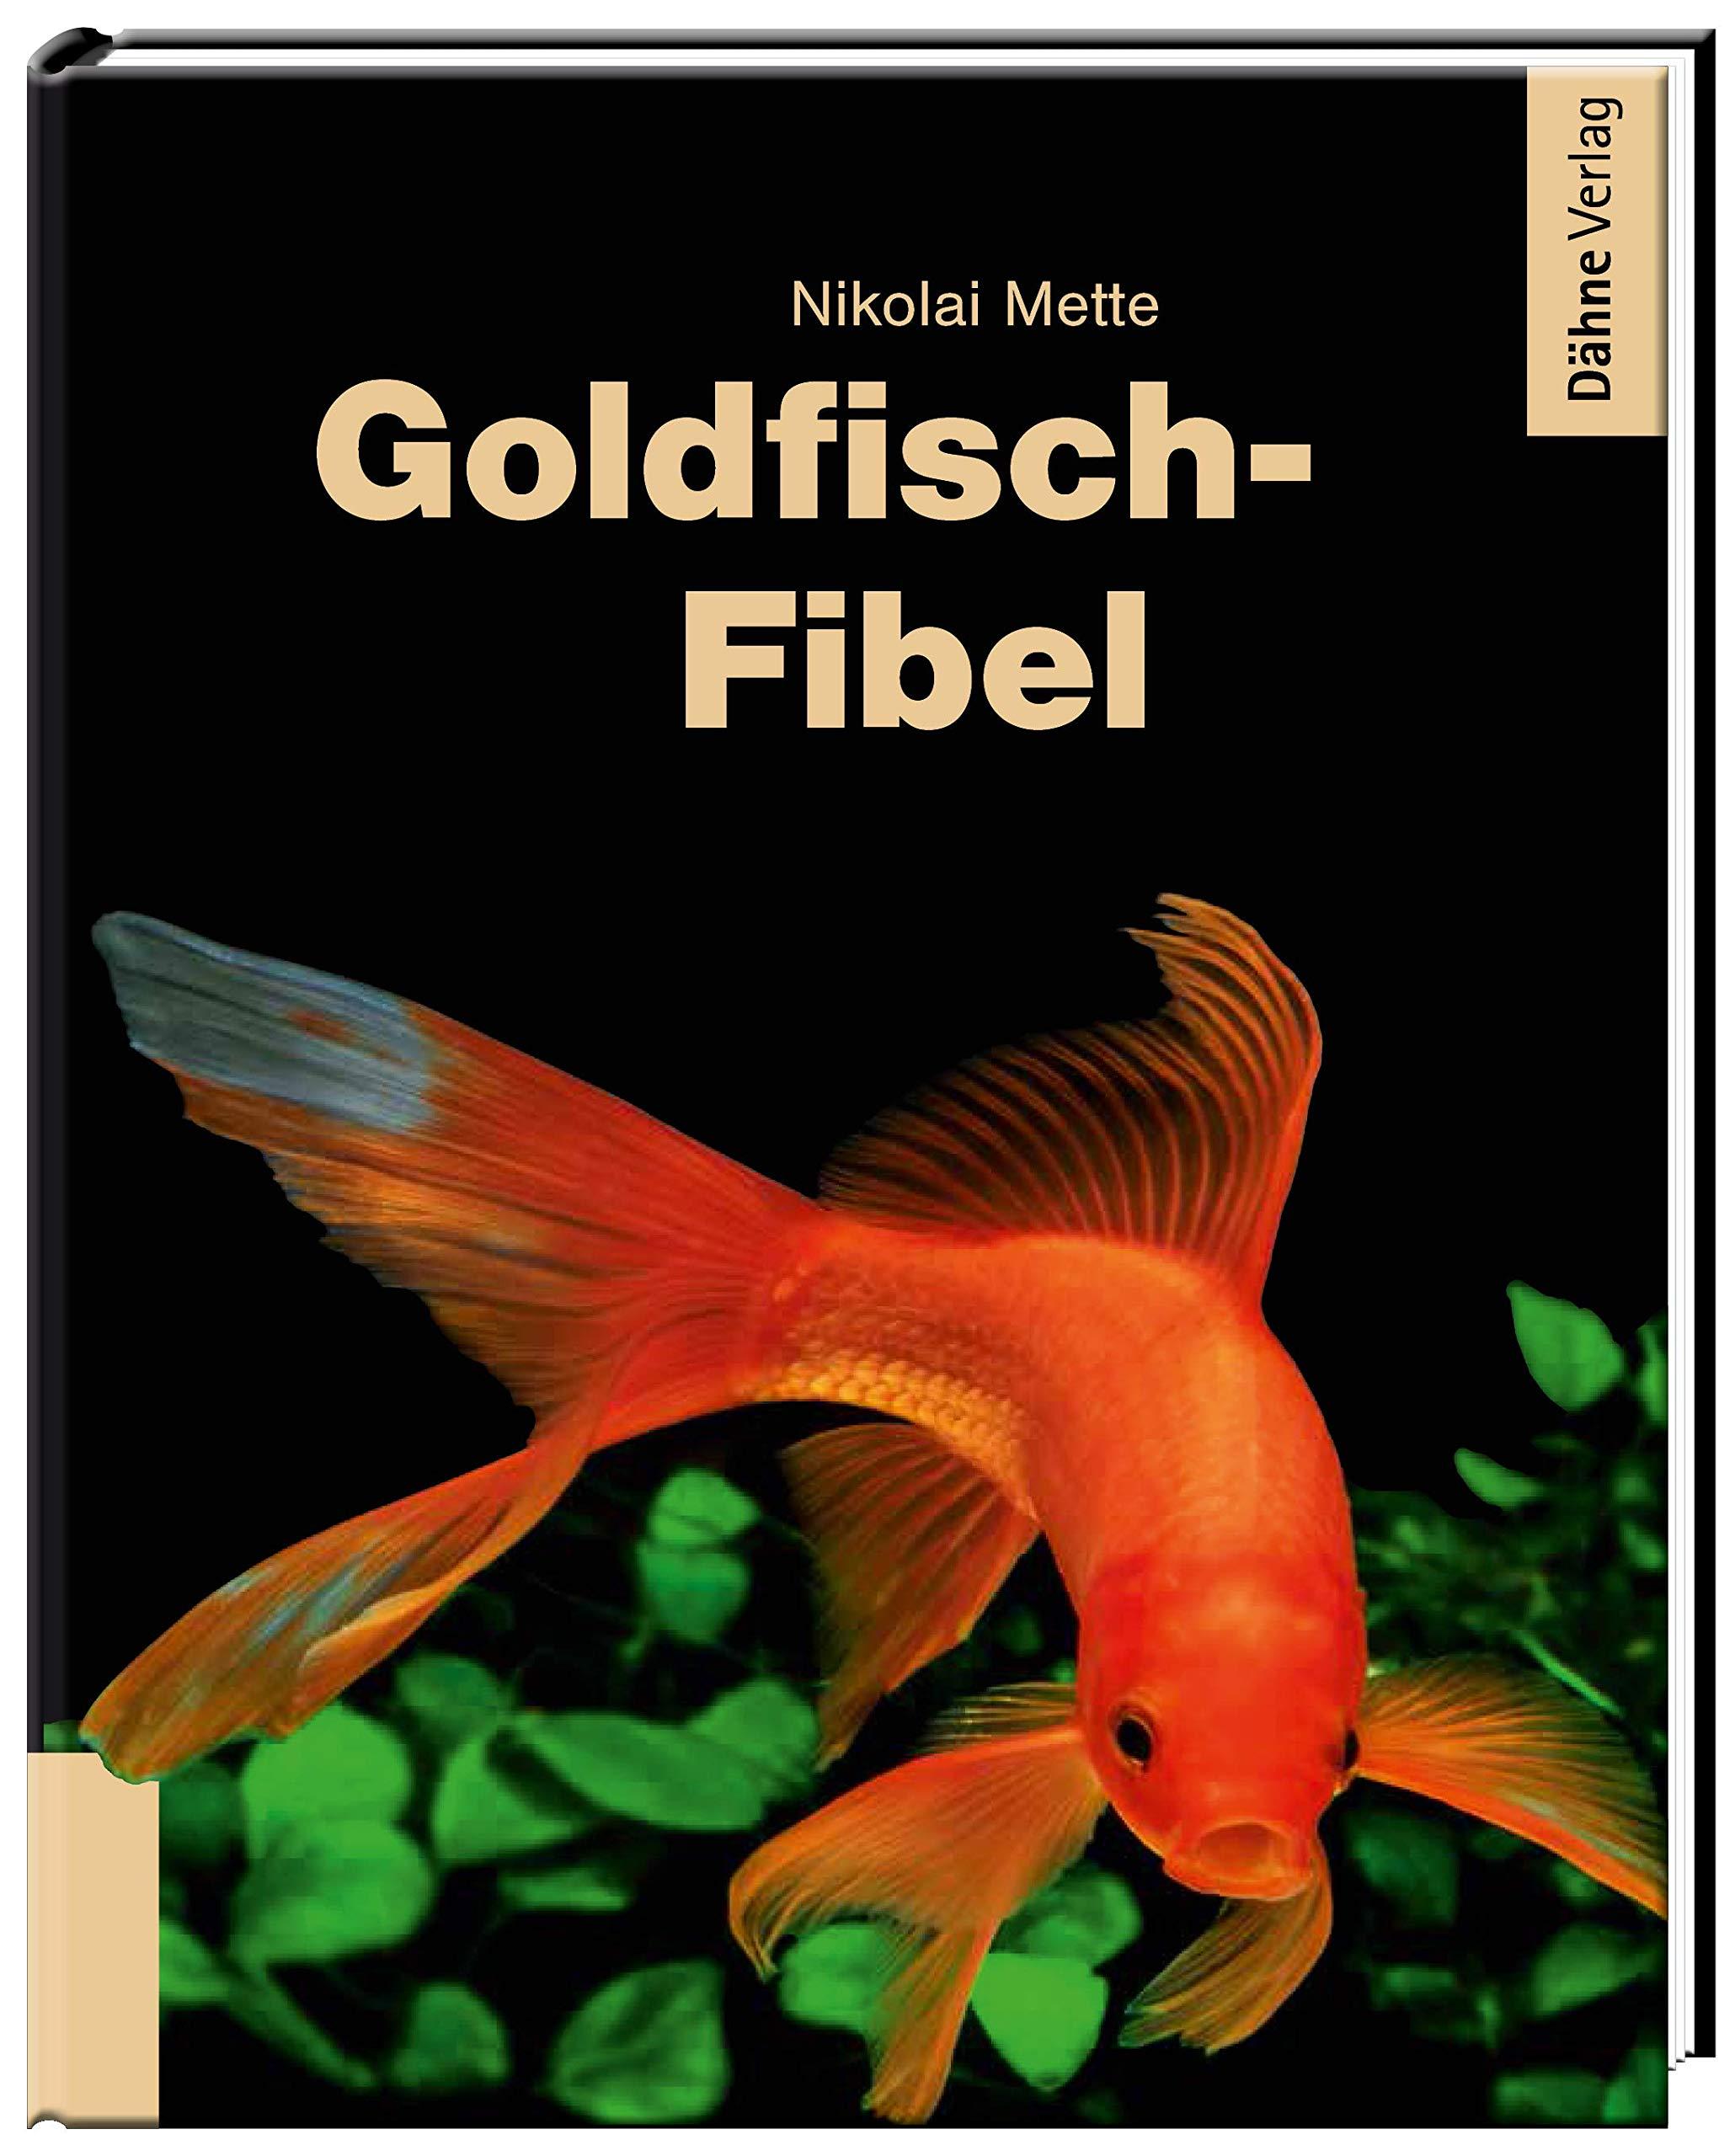 Goldfisch Fibel